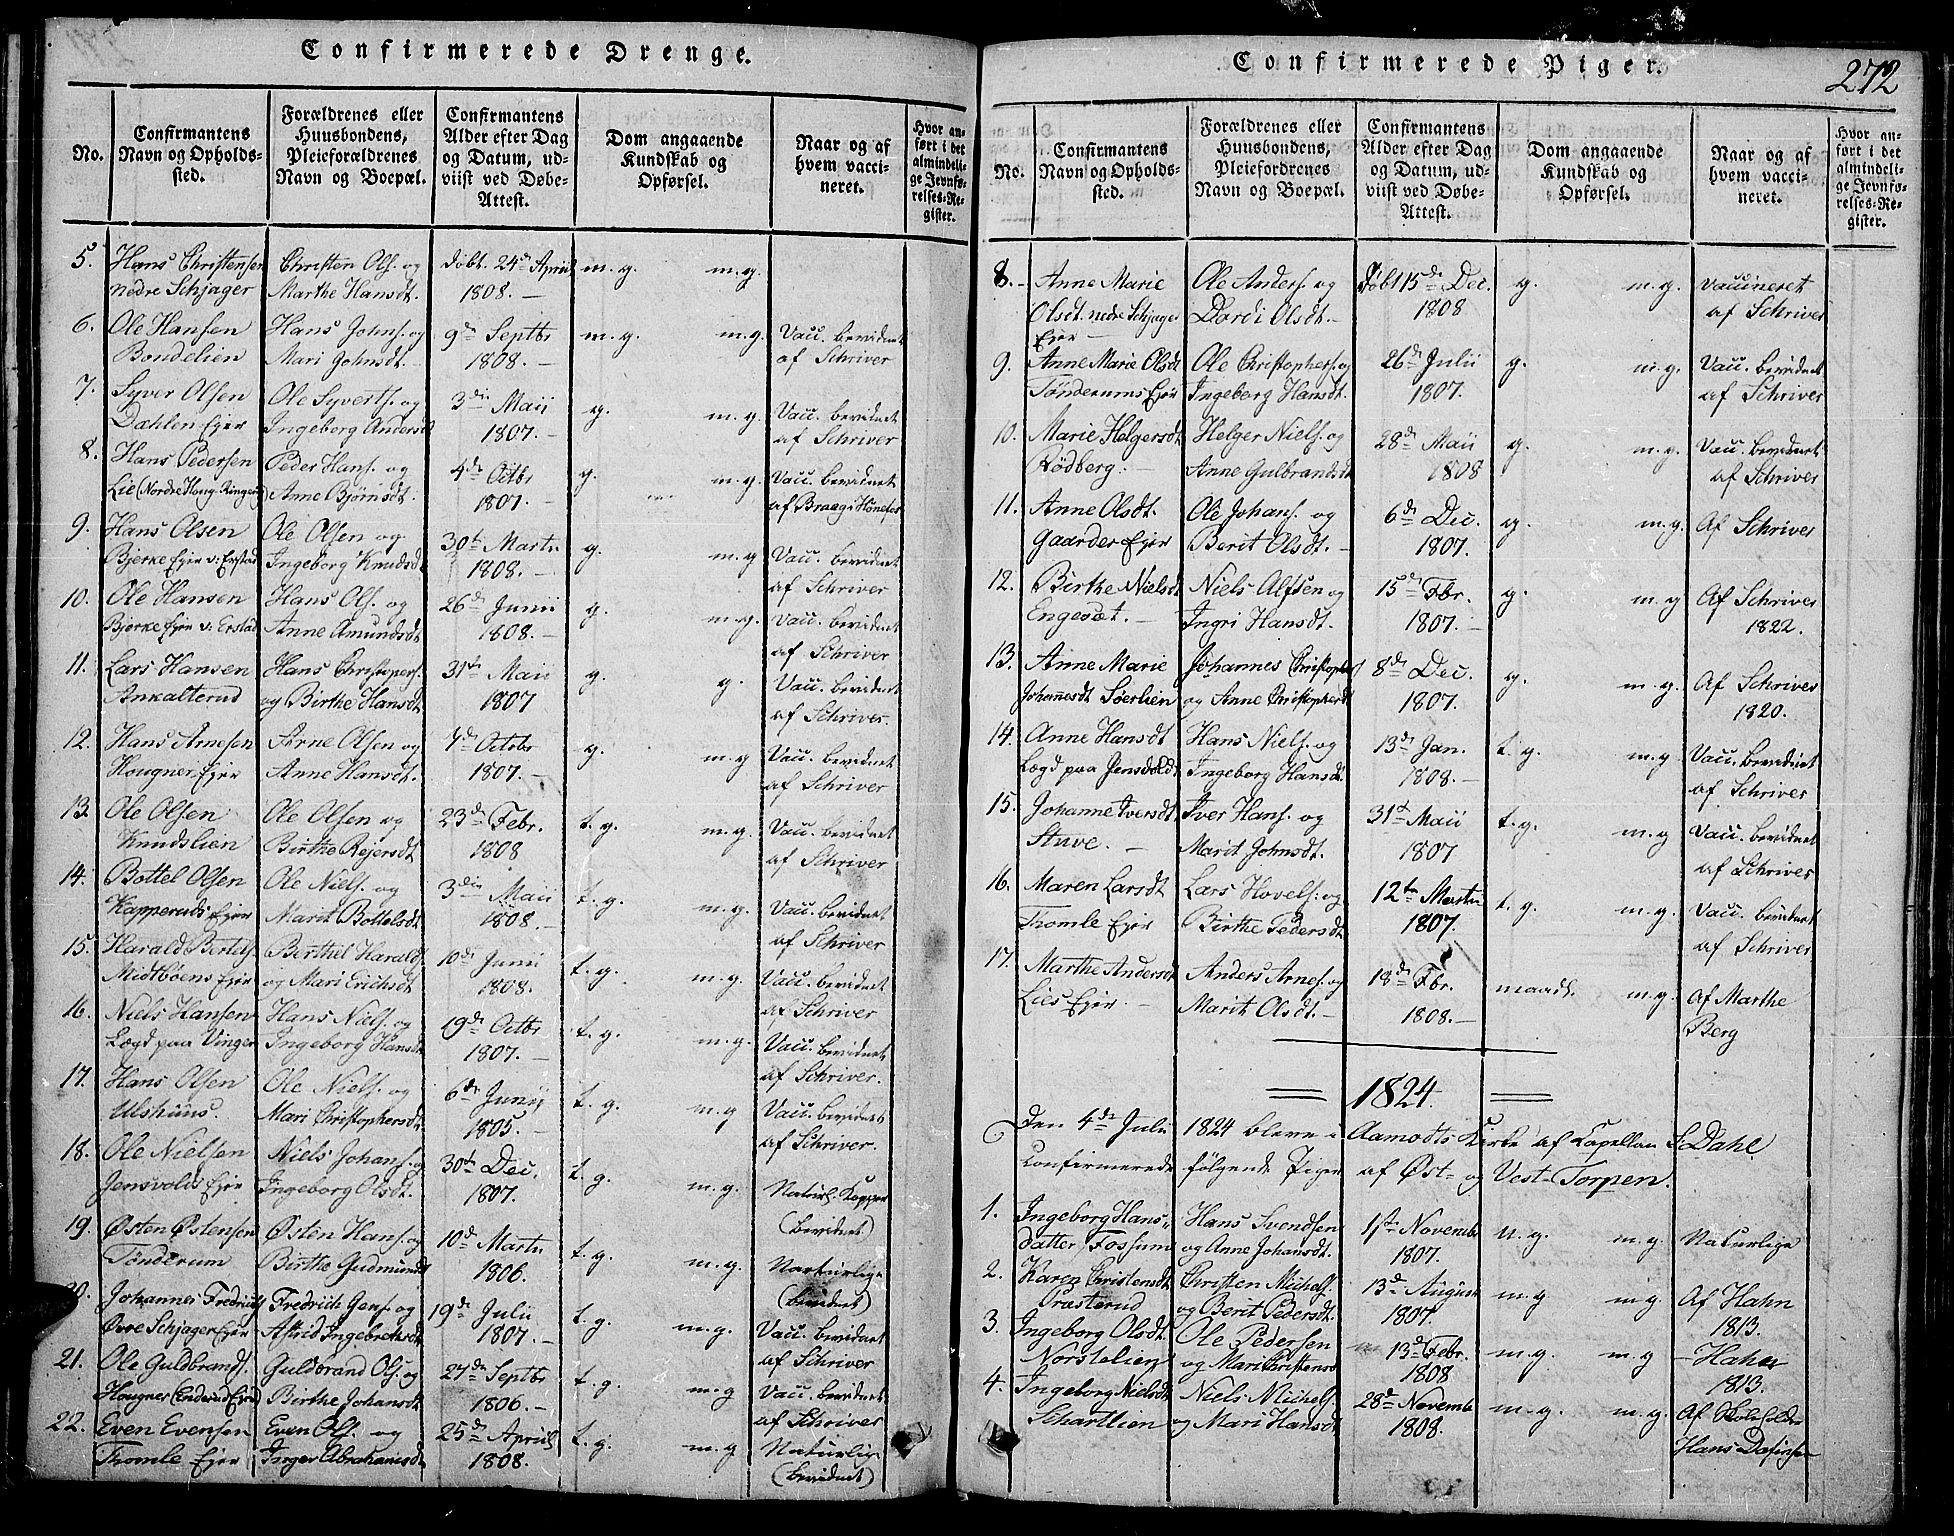 SAH, Land prestekontor, Ministerialbok nr. 7, 1814-1830, s. 272